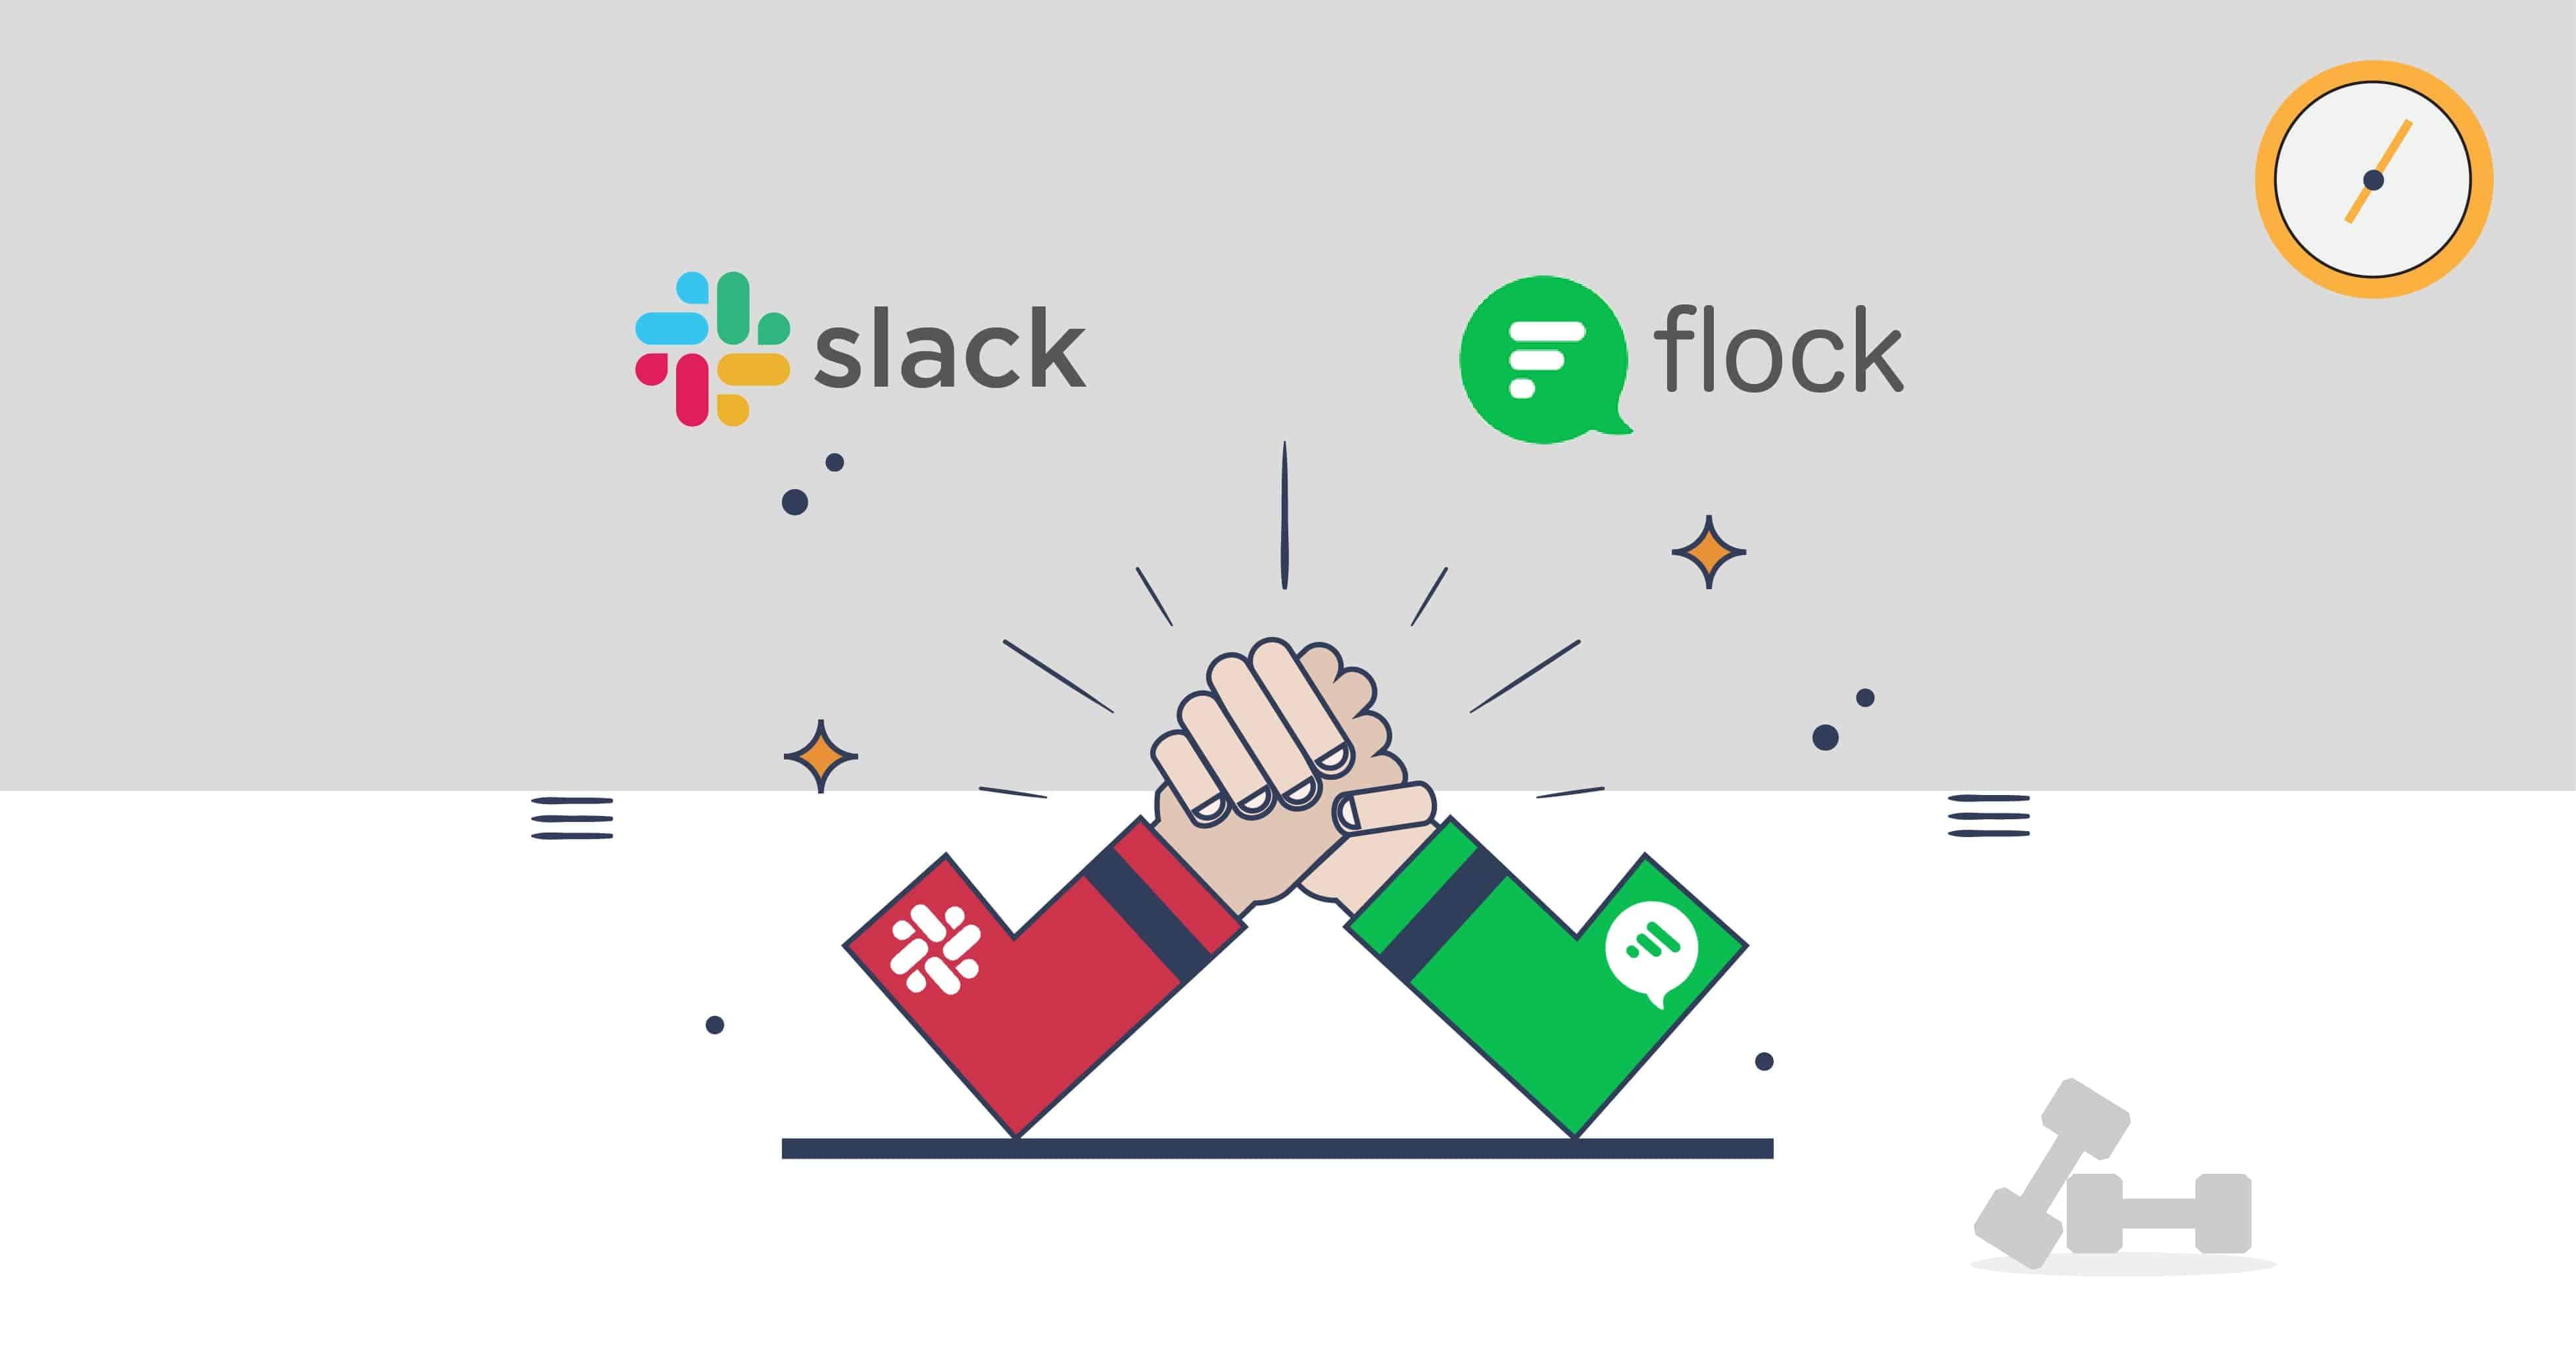 /flock-vs-slack